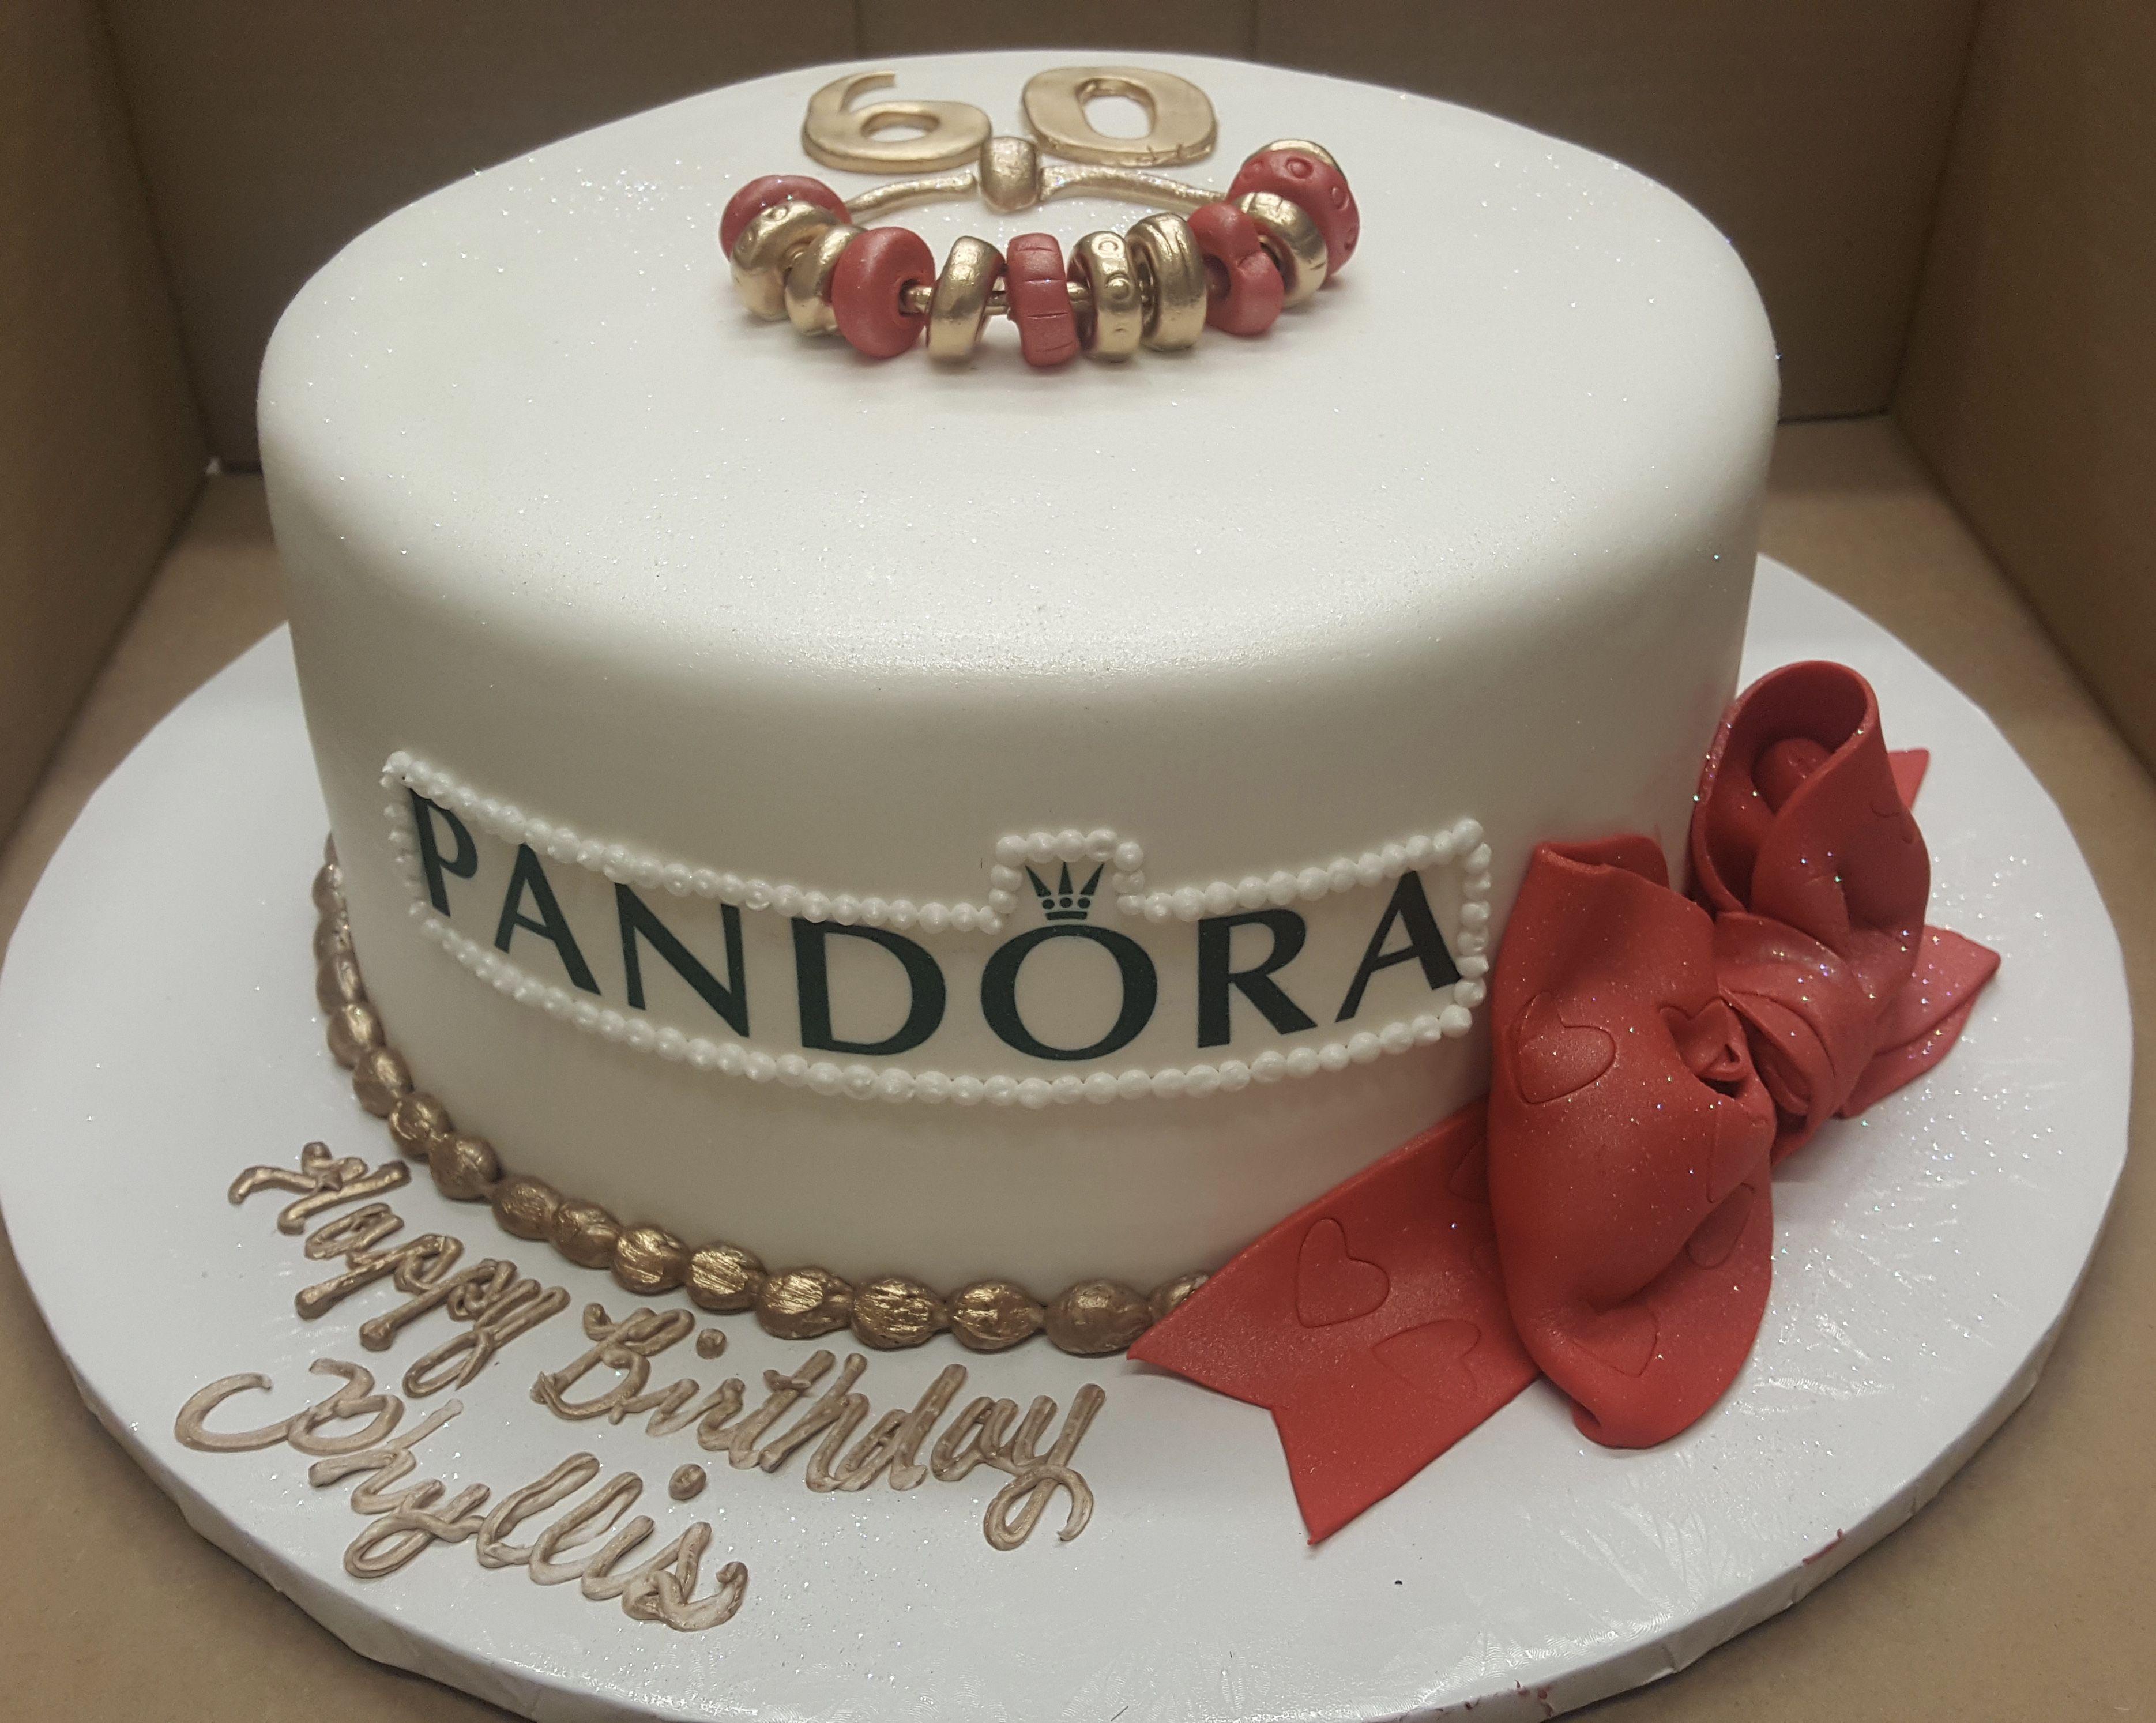 Pleasing Calumet Bakery Pandora Fondant Birthday Cake With Images Funny Birthday Cards Online Alyptdamsfinfo